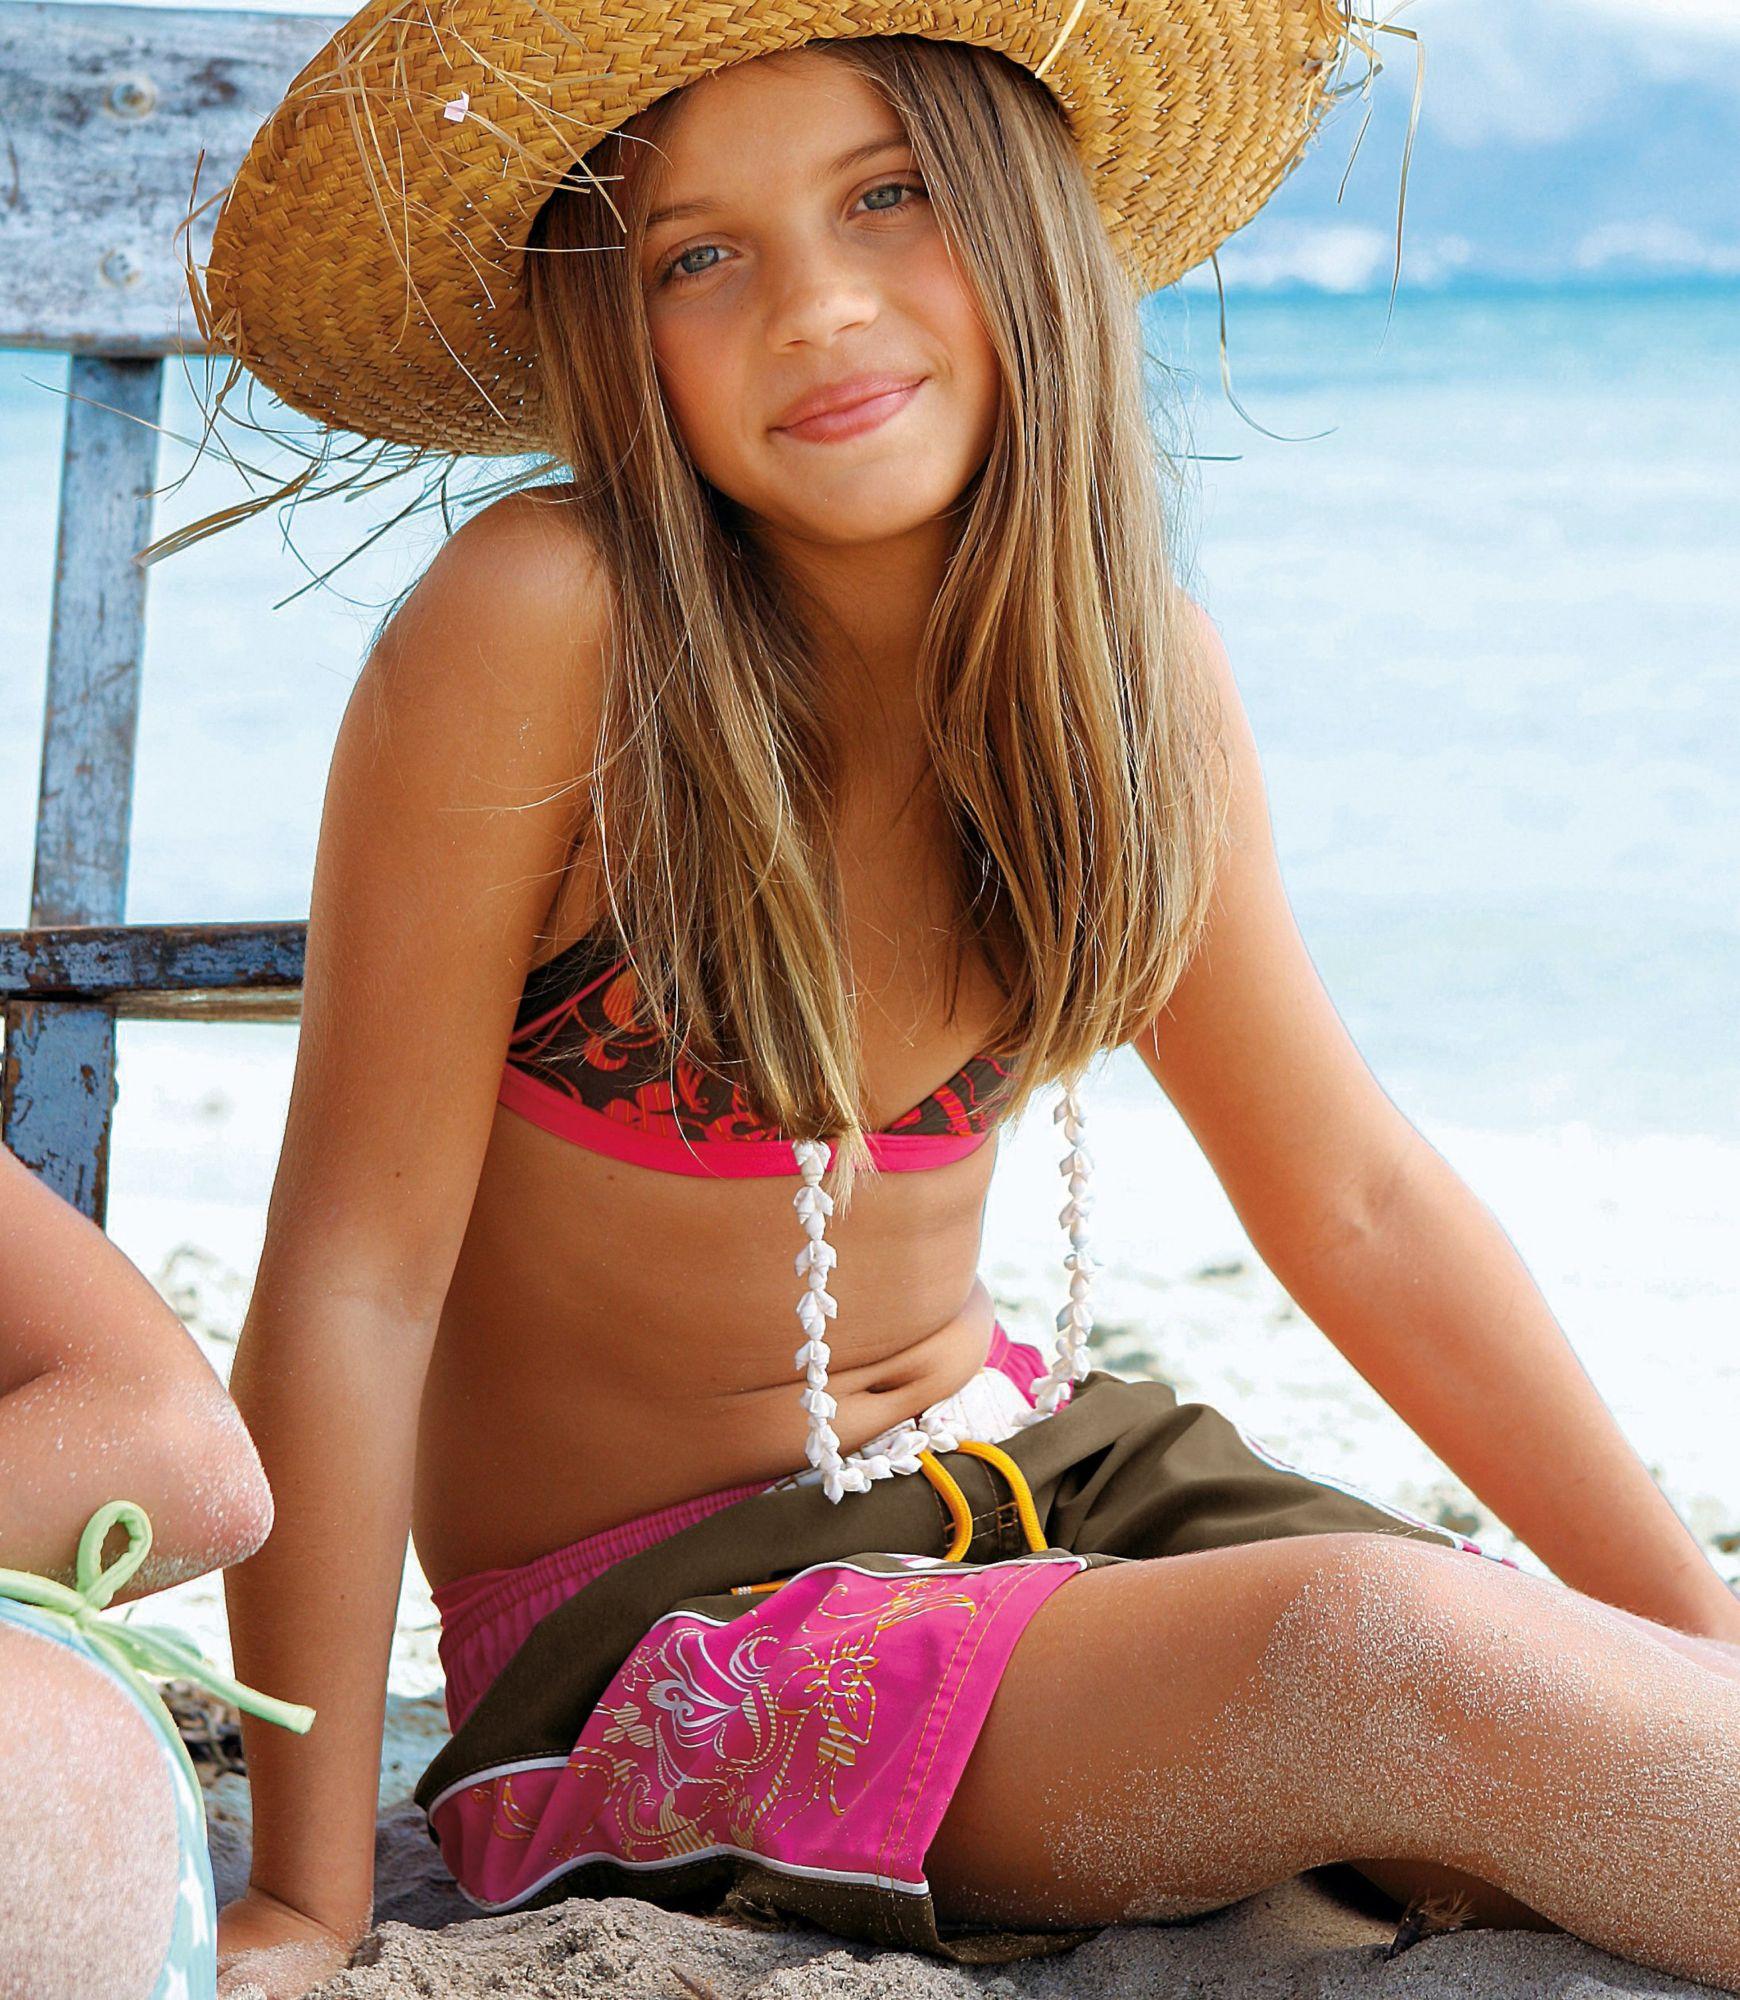 Ls island girls topless, motorbike teen fuck